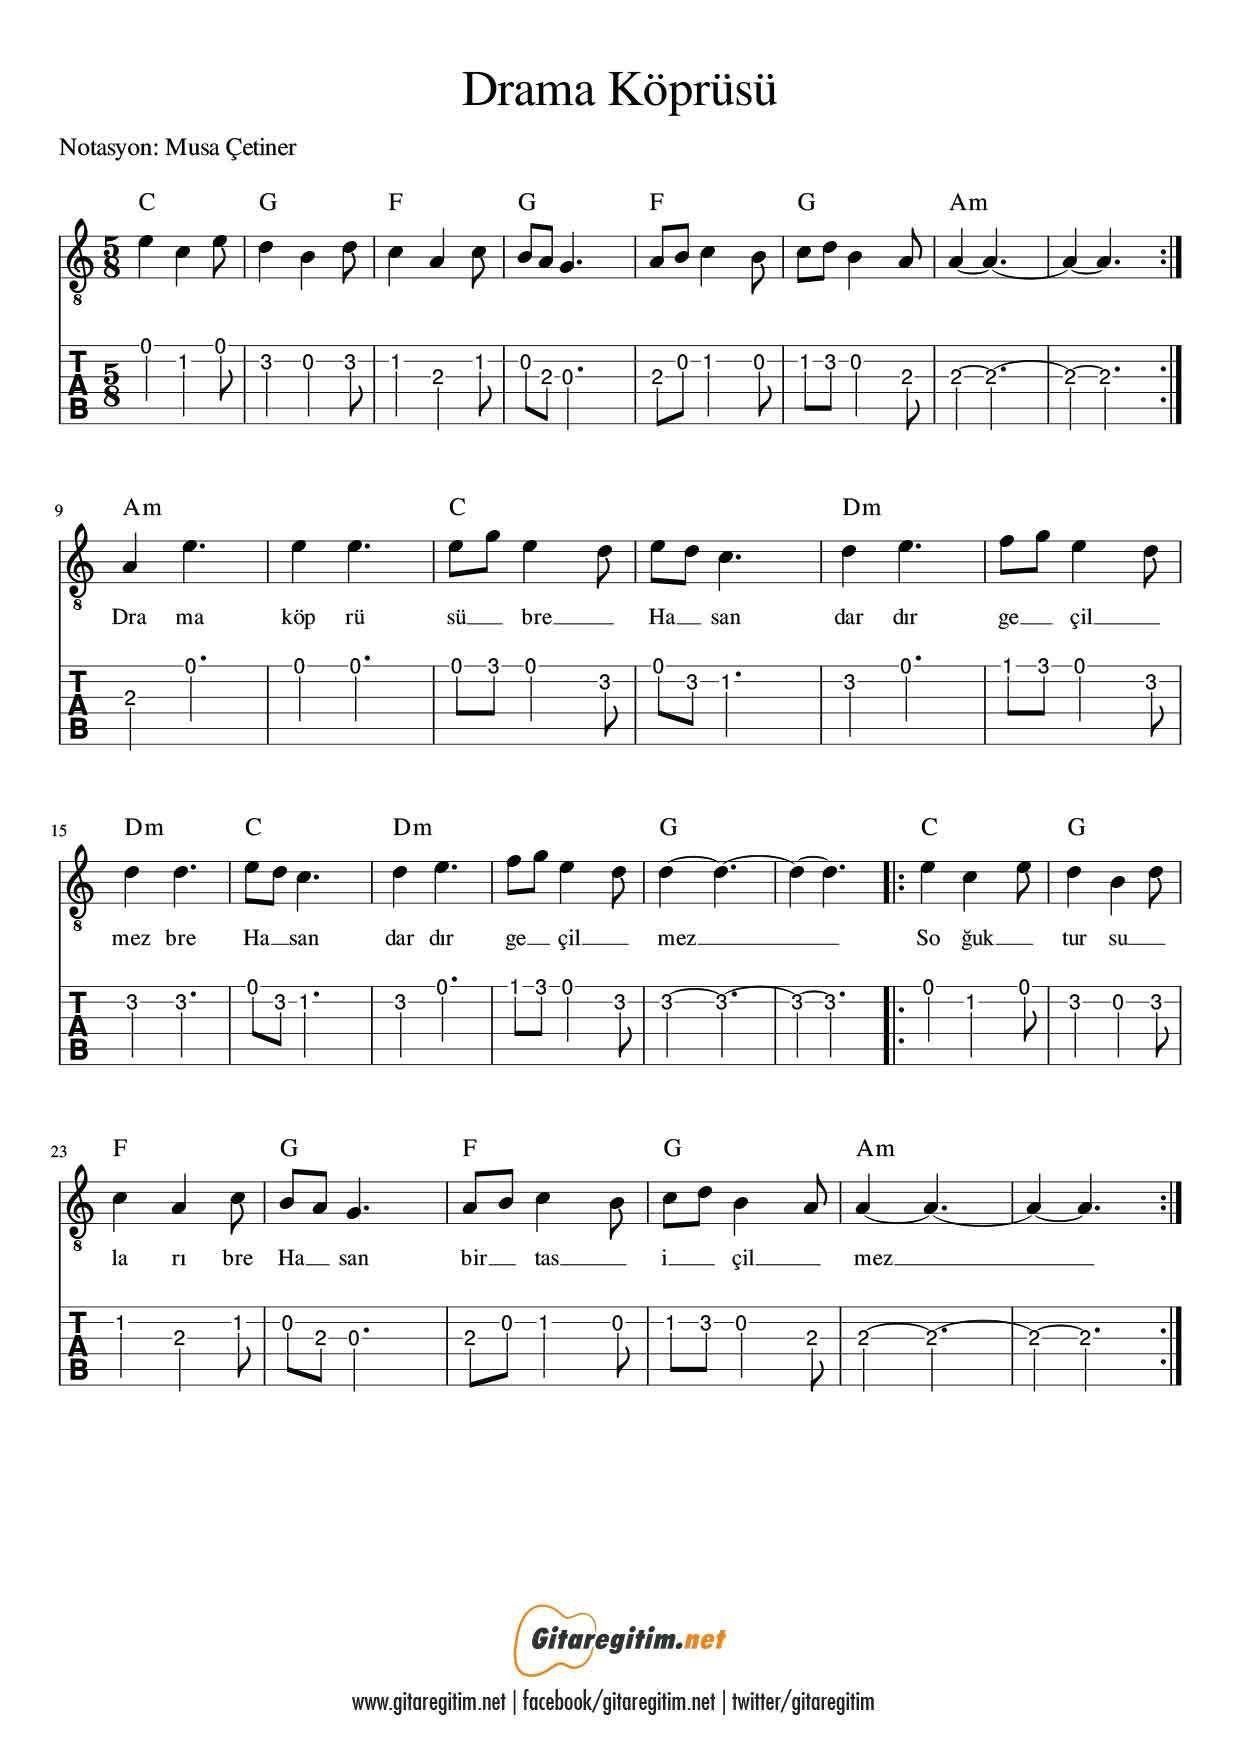 Drama Koprusu Nota Tab Guitar Gitar Nota Tab Score Music Muzik Musique Drama Koprusu Nota Tab Musik Drama K Drama